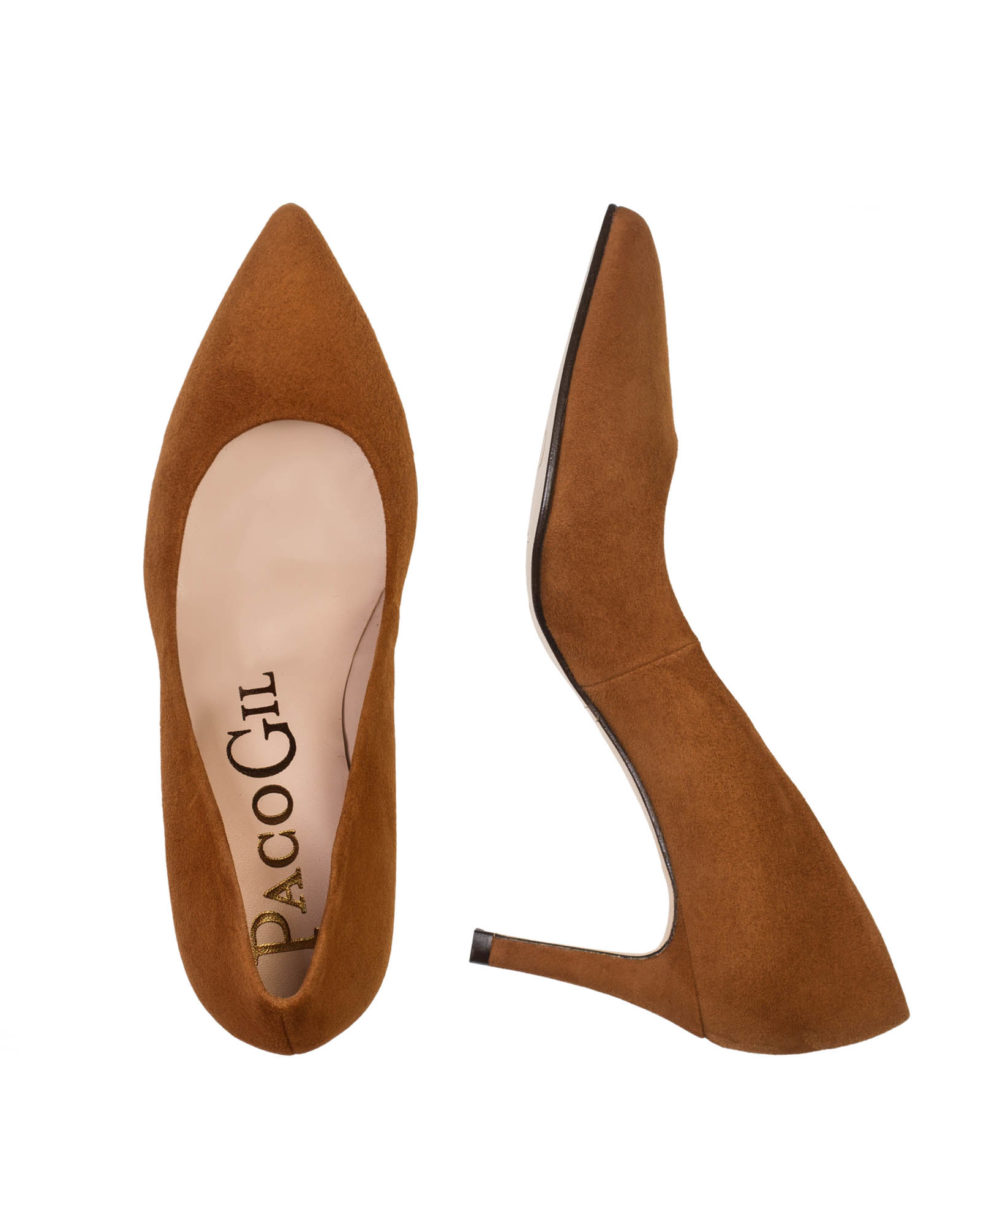 Zapatos de salón de Paco Gil. Zapatos de piel modelo Rita. Foto par completo diferentes perspectivas